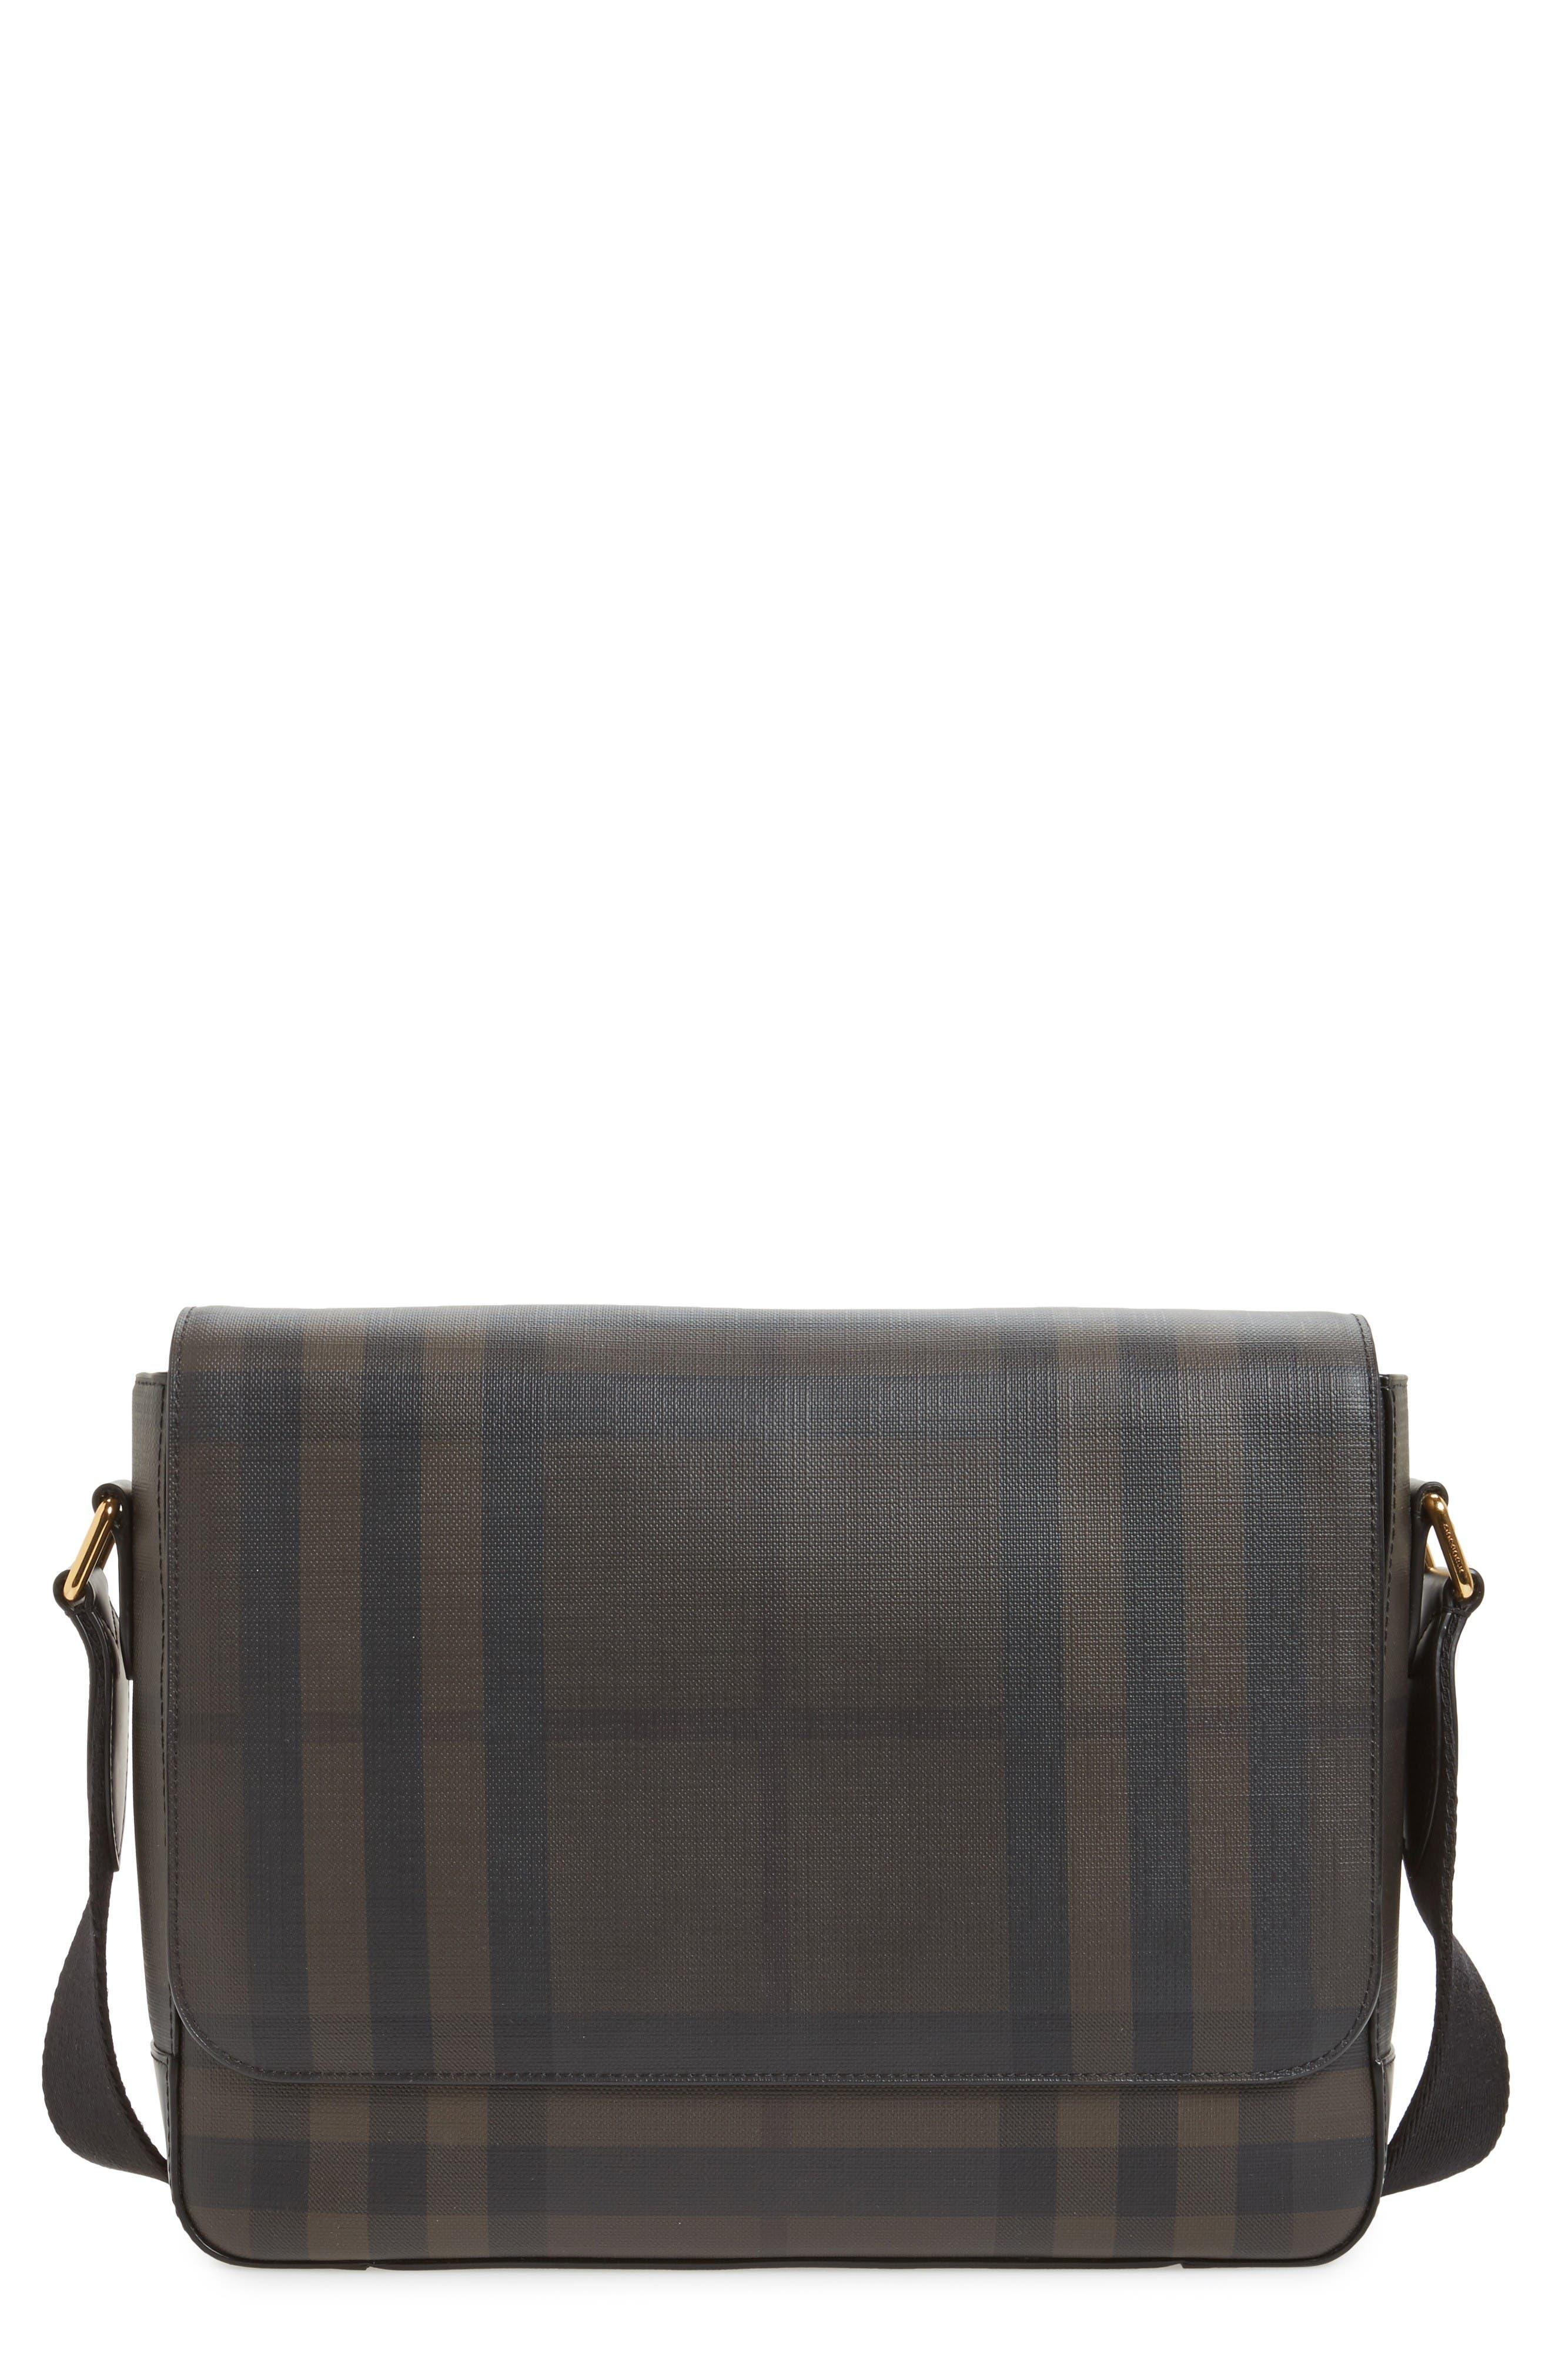 Edgware Check Messenger Bag,                         Main,                         color, Chocolate/ Black